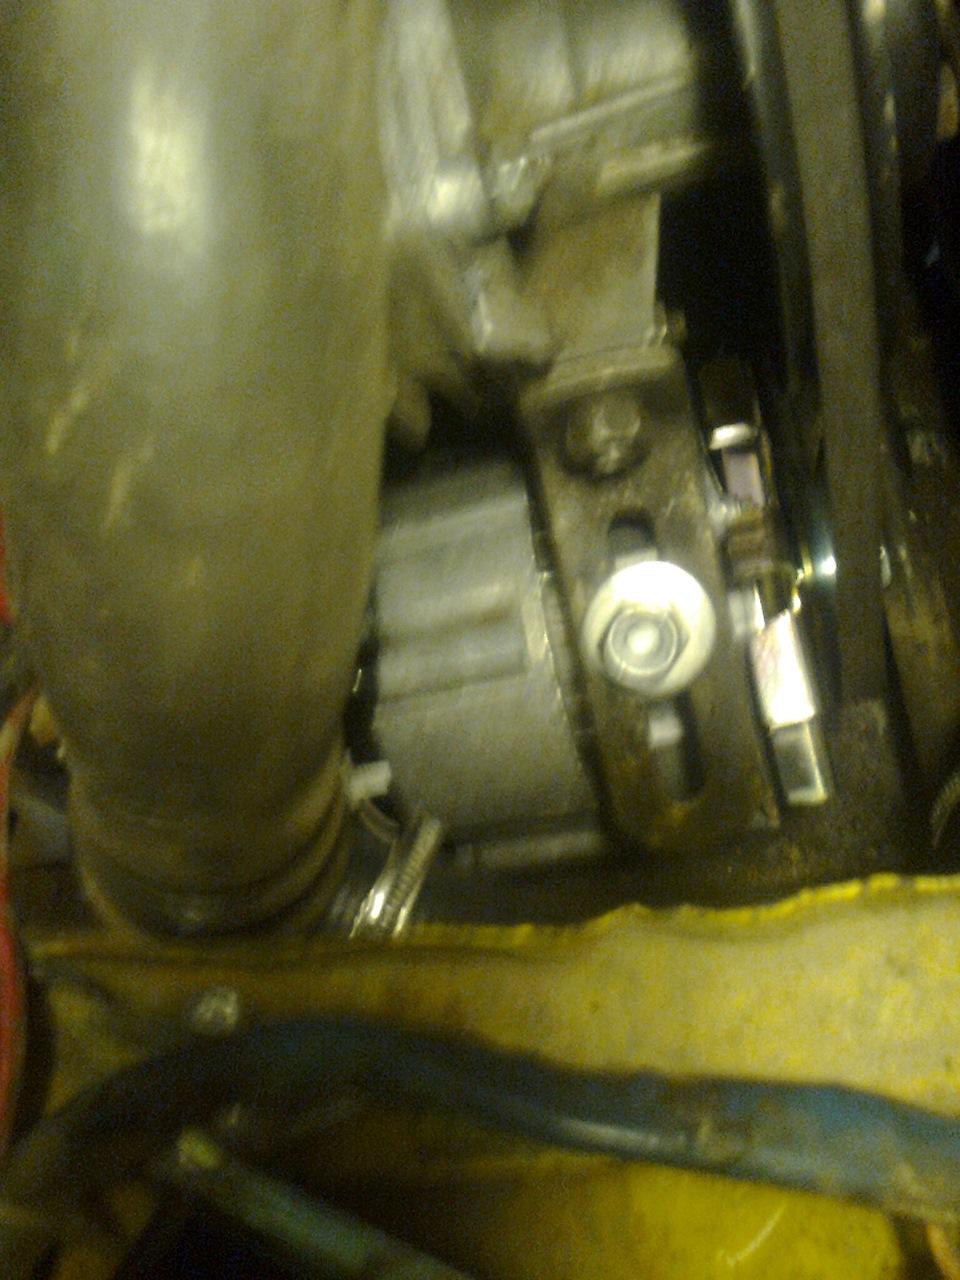 генератор 3701 эл схема